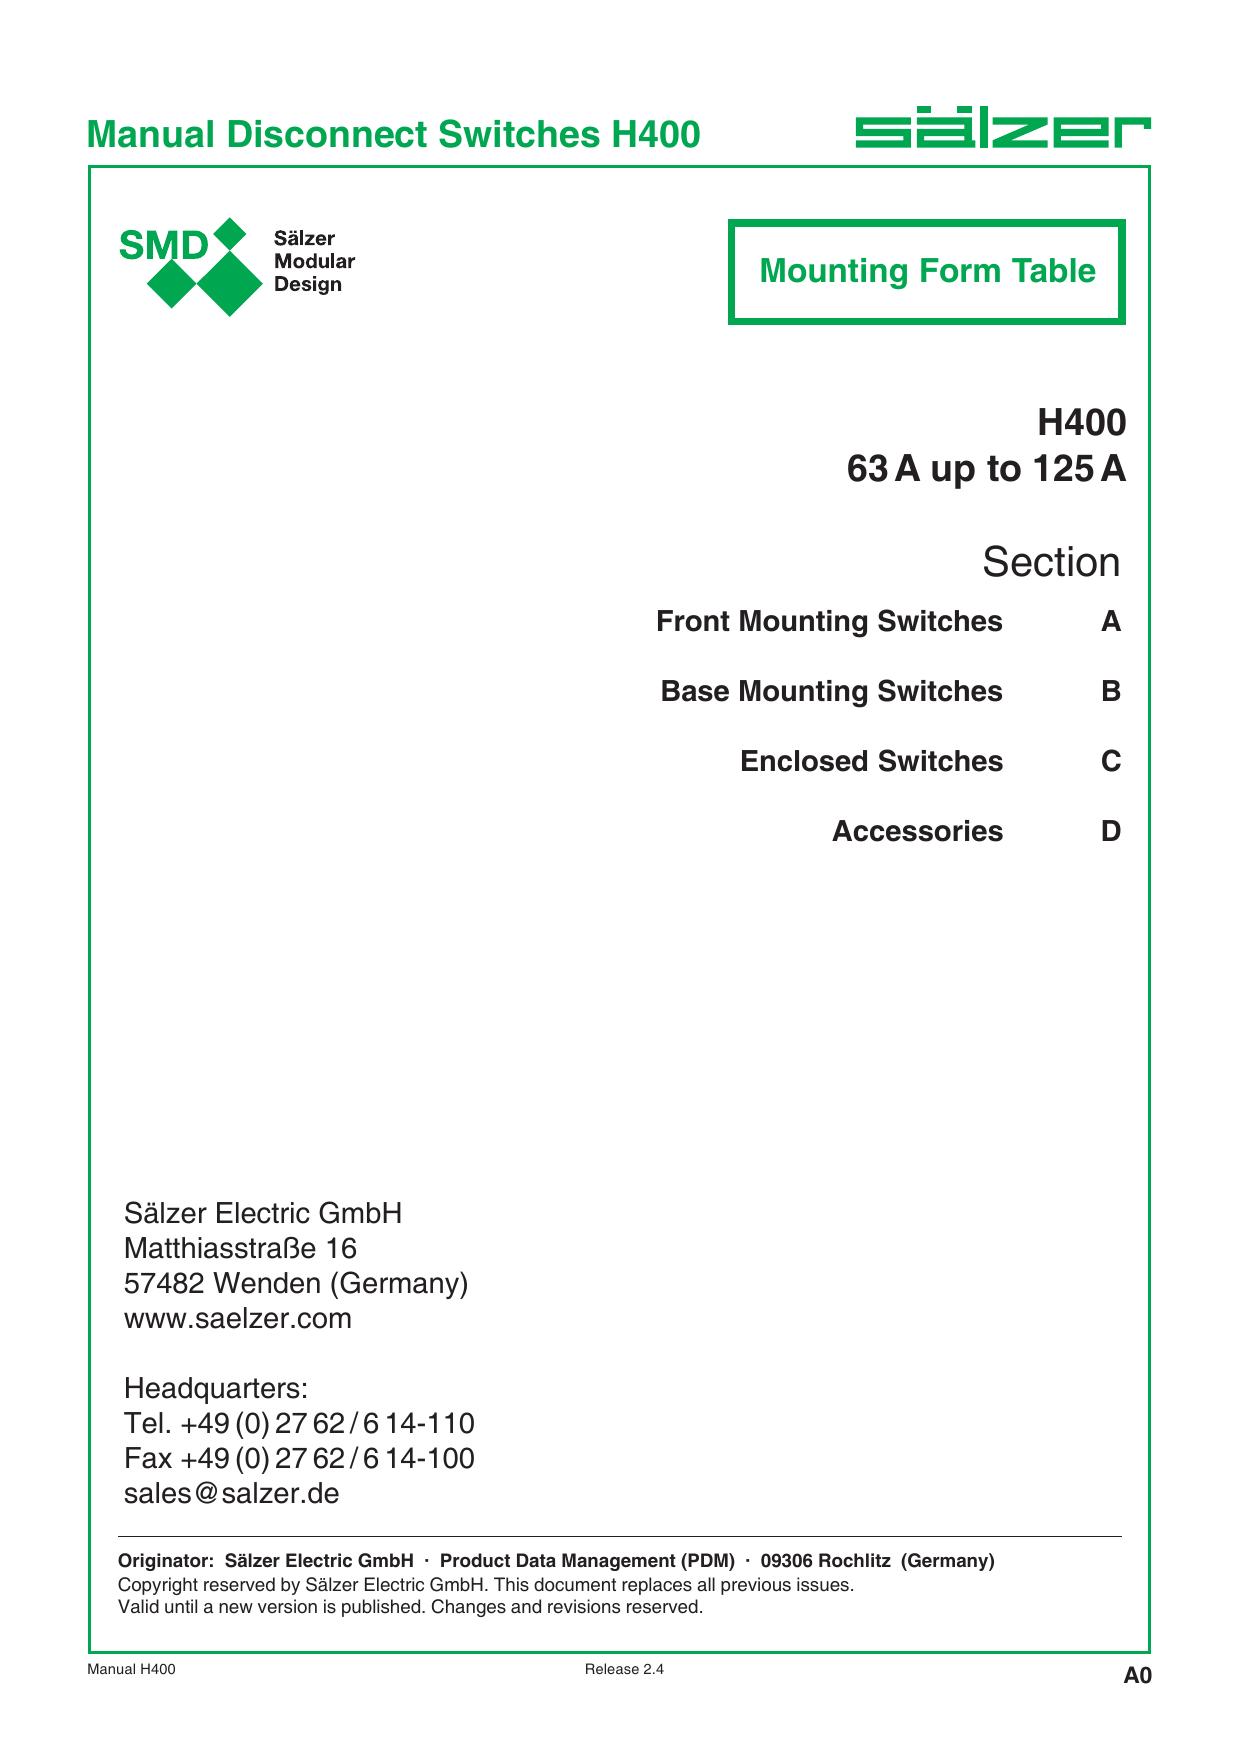 Manual 8021 63 125 Msd Wiring Diagram Array Rh Logoutev De